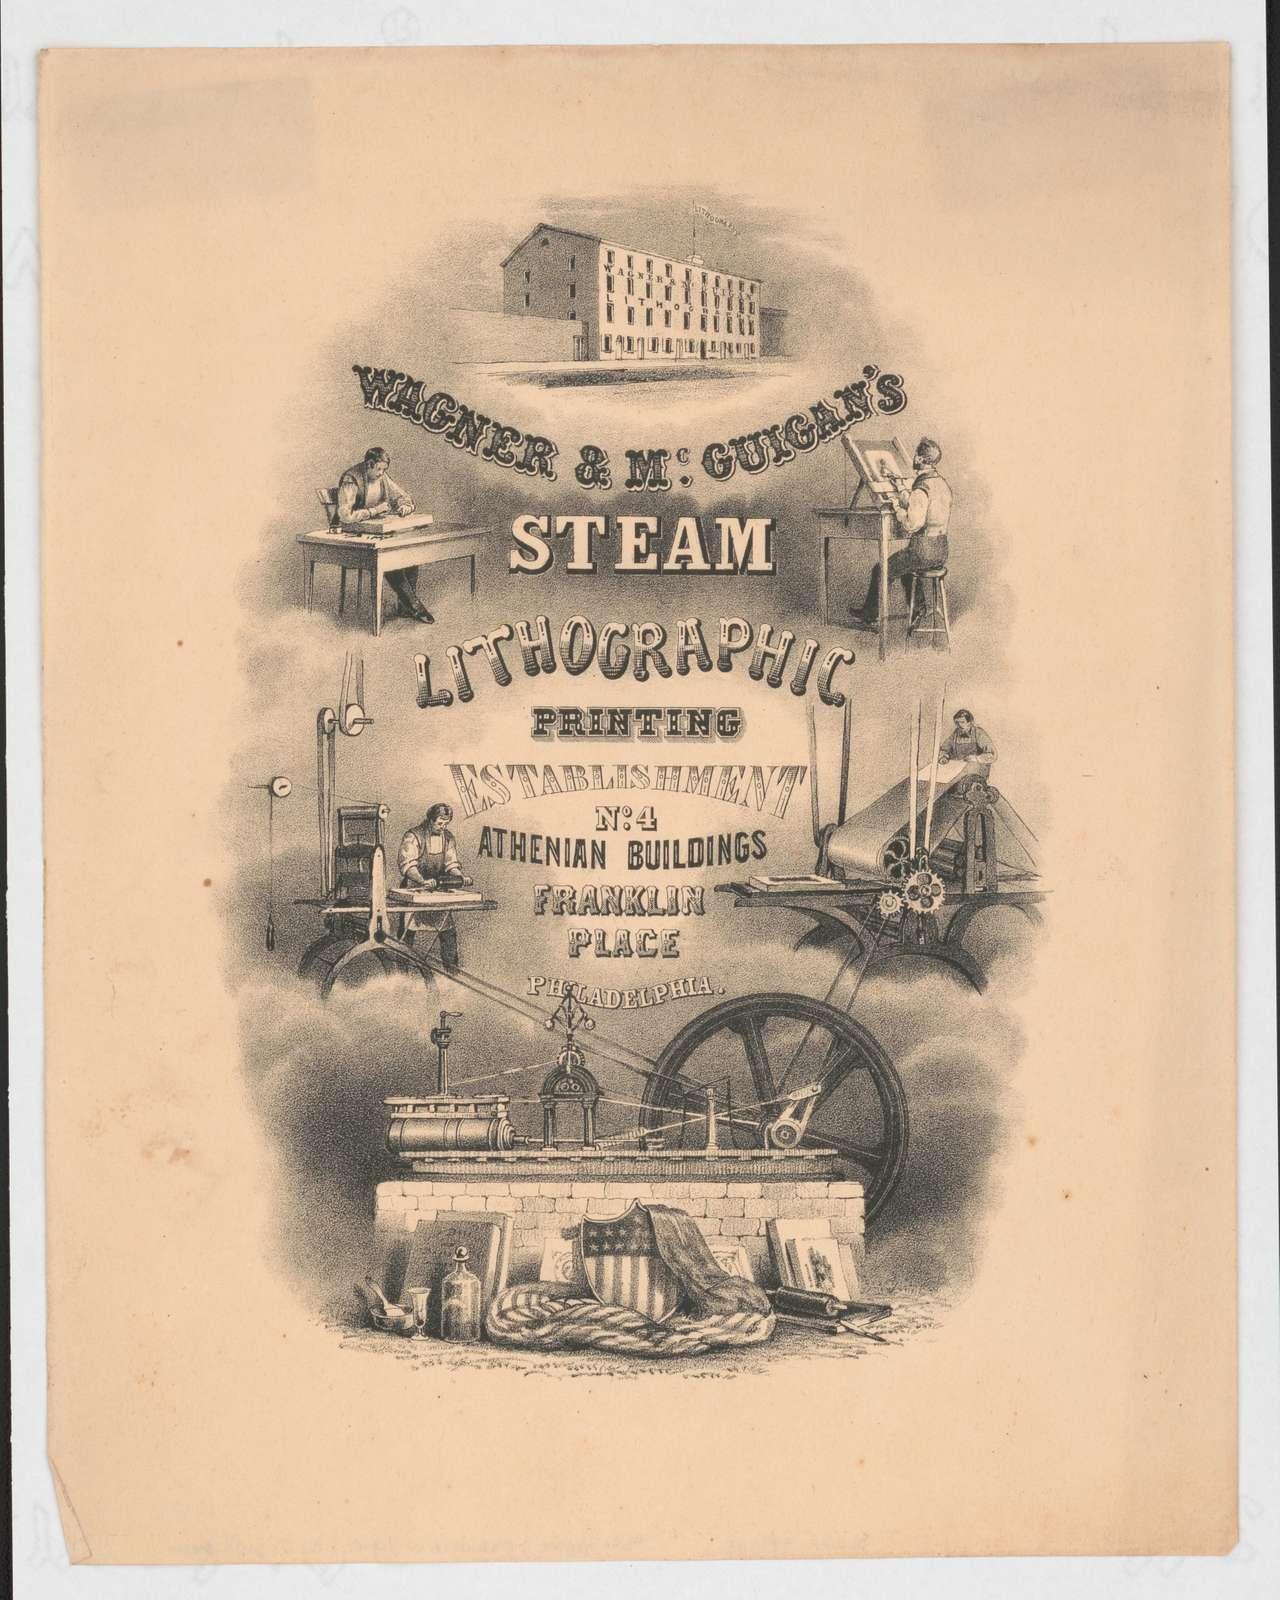 Wagner & McGuigan's Steam Lithographic Printing Establishment, No. 4 Athenian Buildings, Franklin Place, Philadelphia